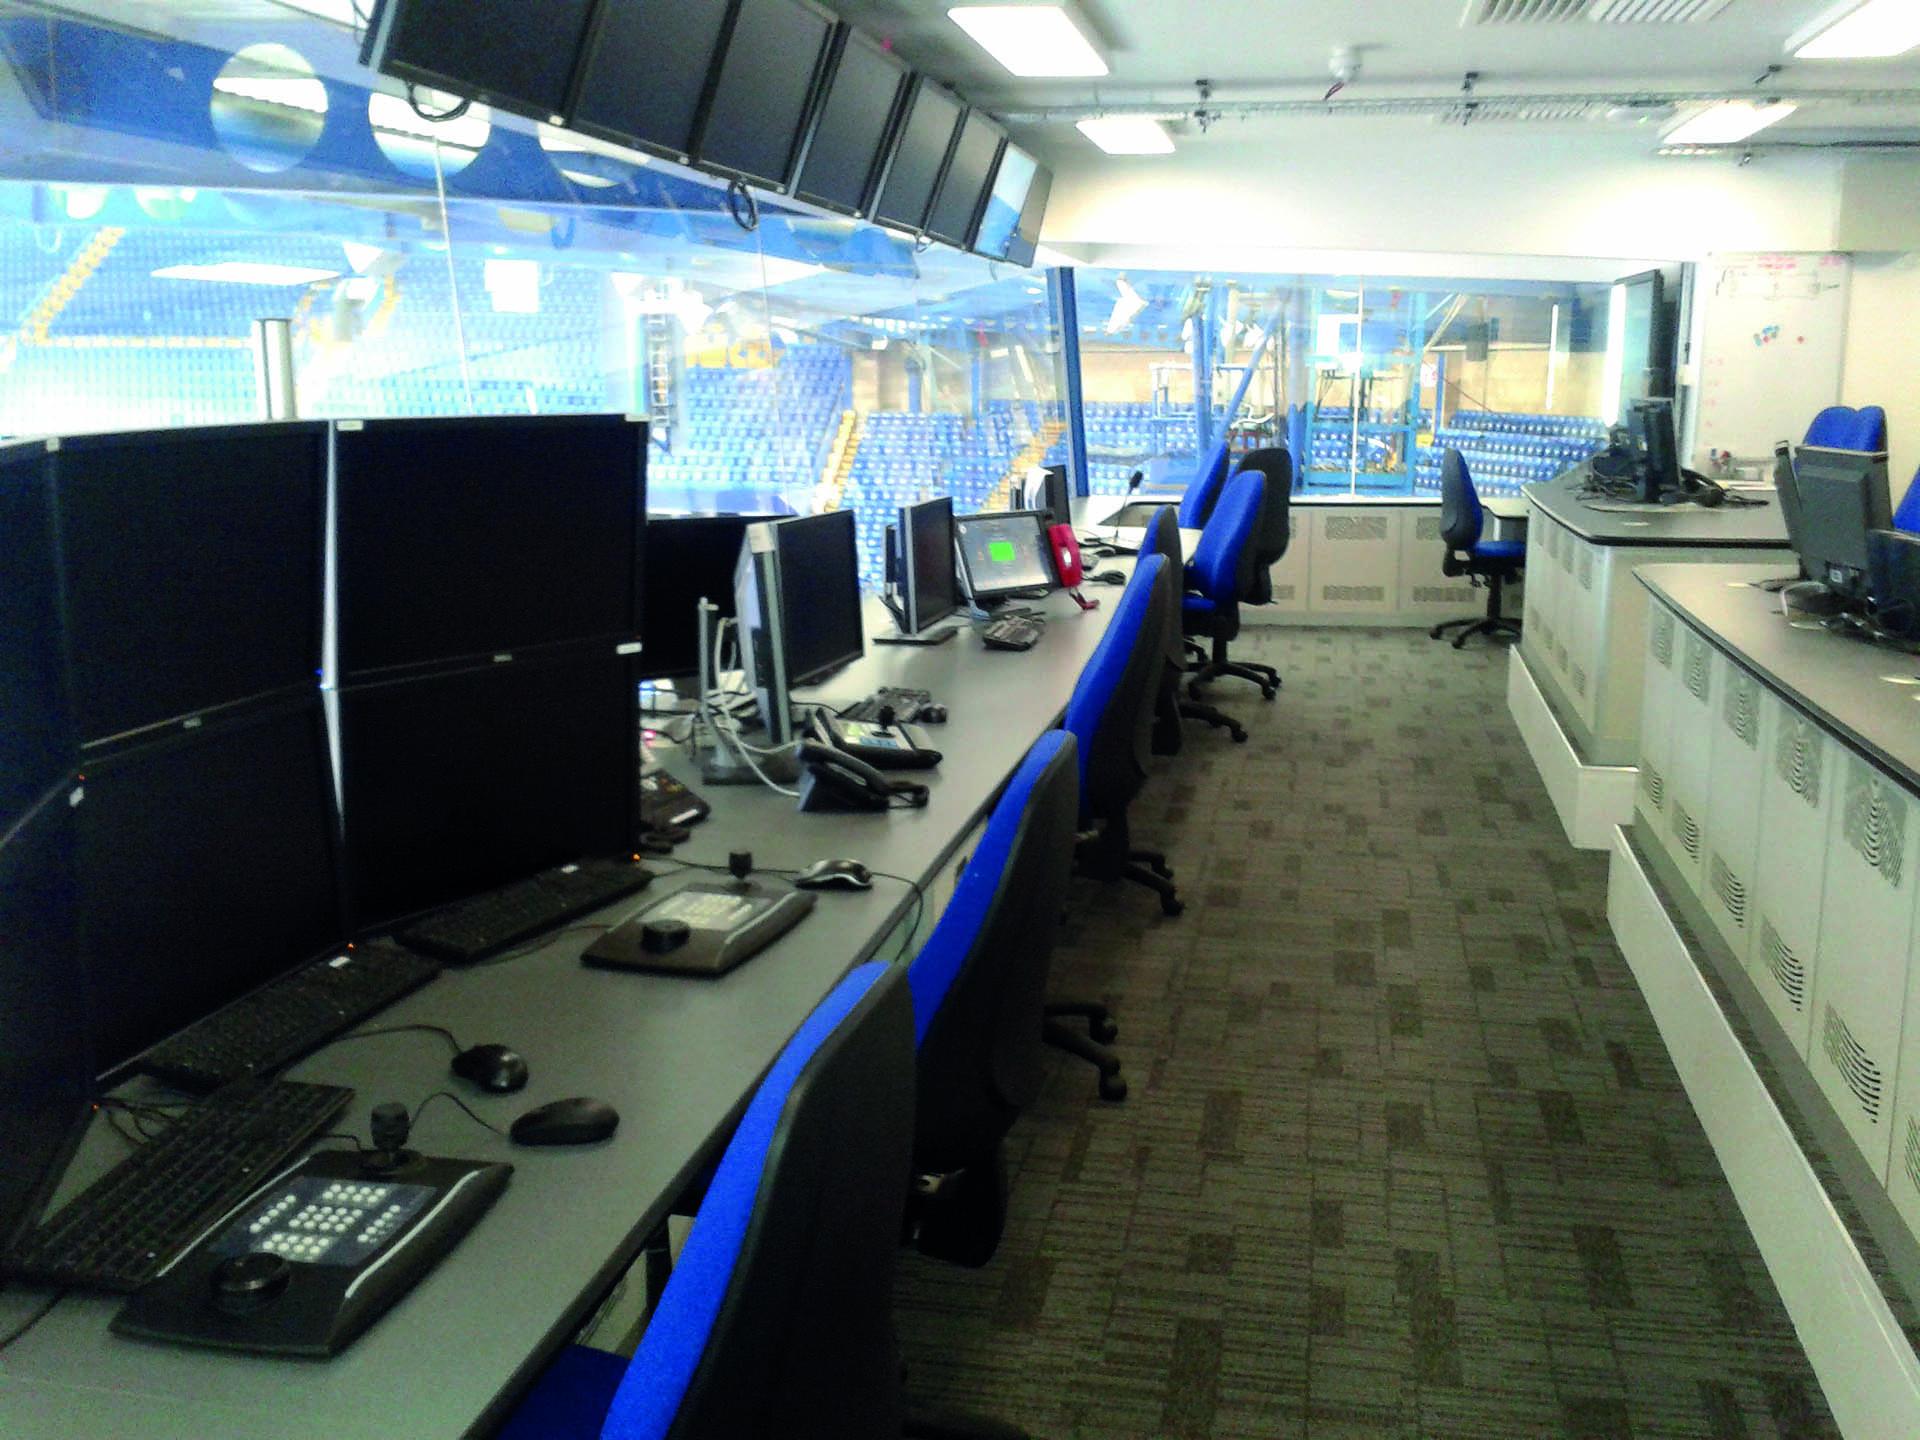 control room furniture sporting arena